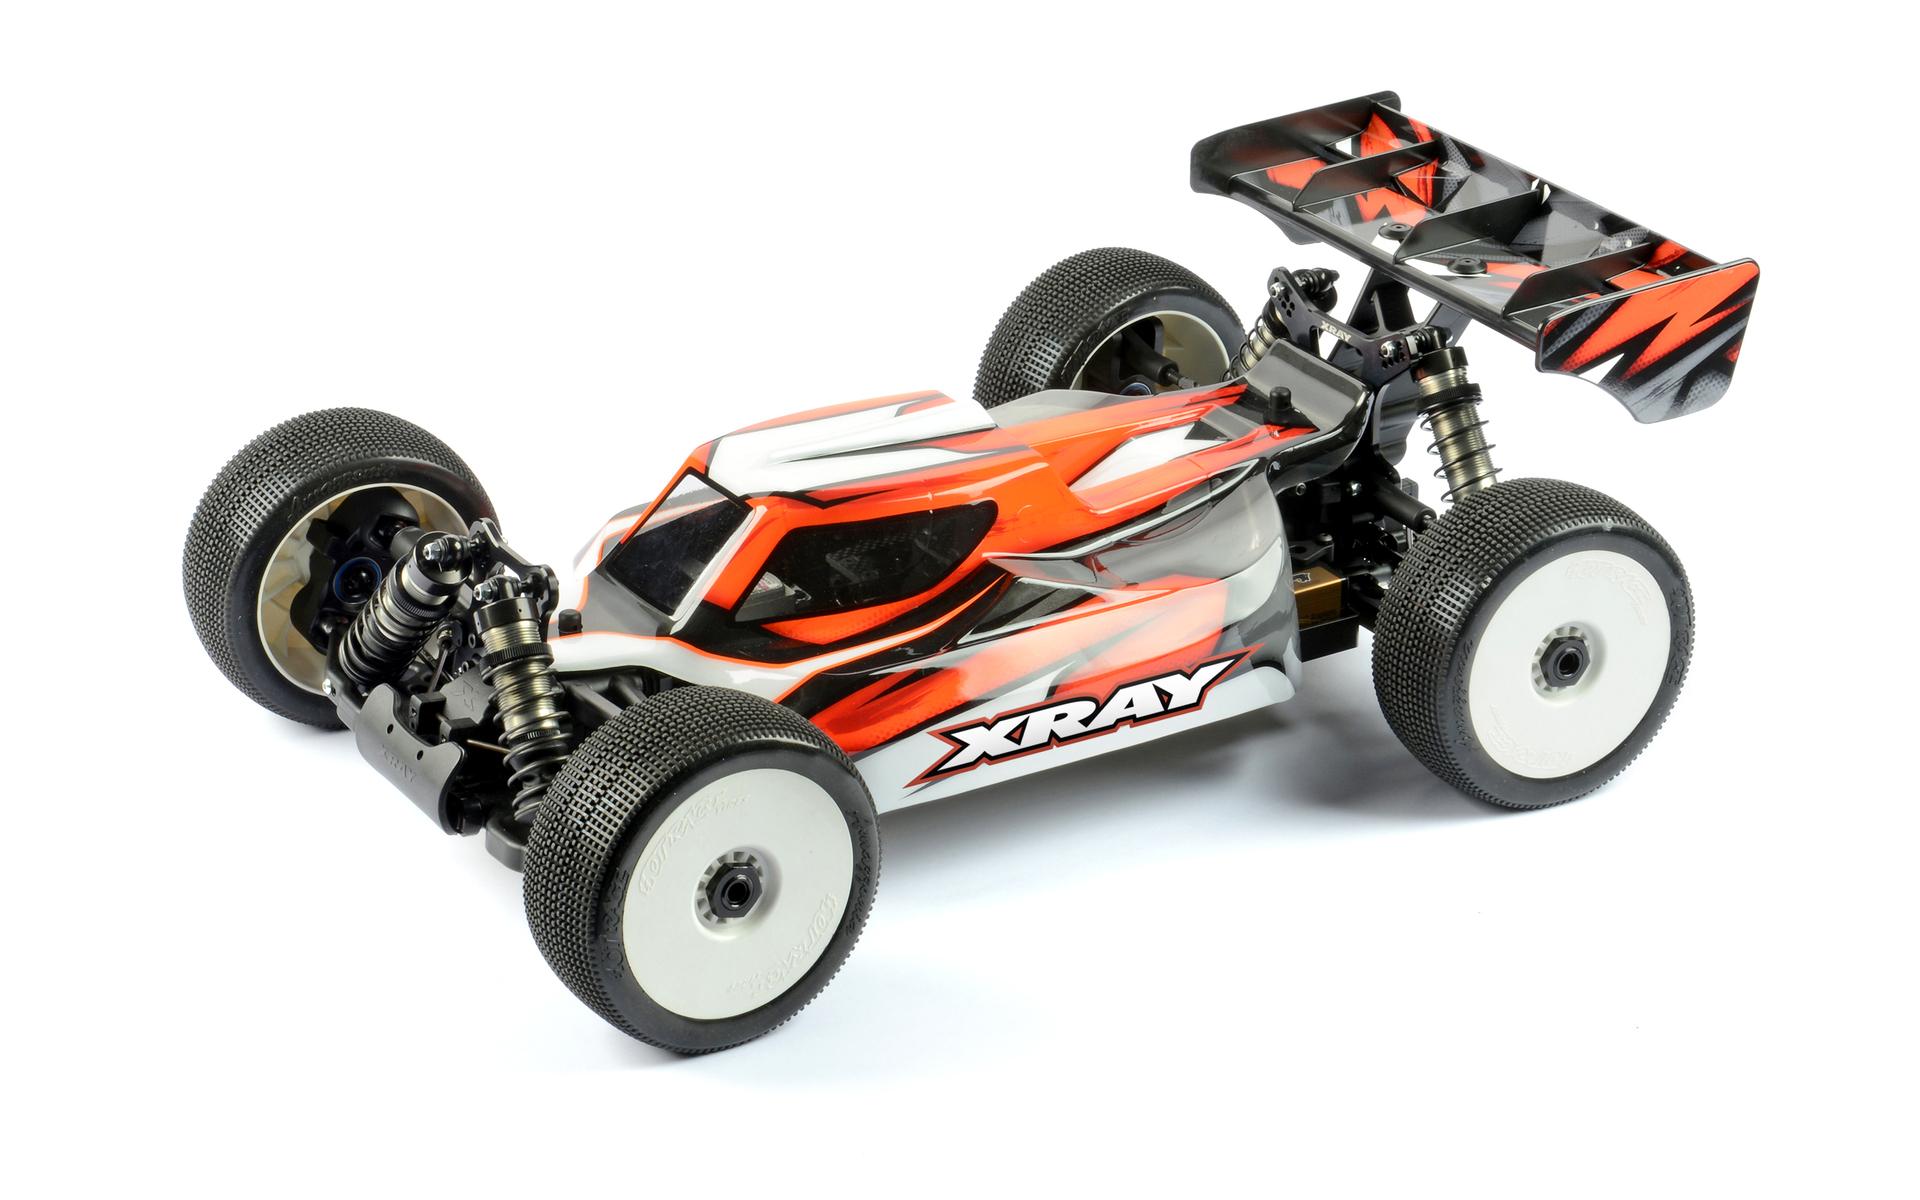 Team XRAY XB8E 2021 1/8 Offroad Race Car 350158